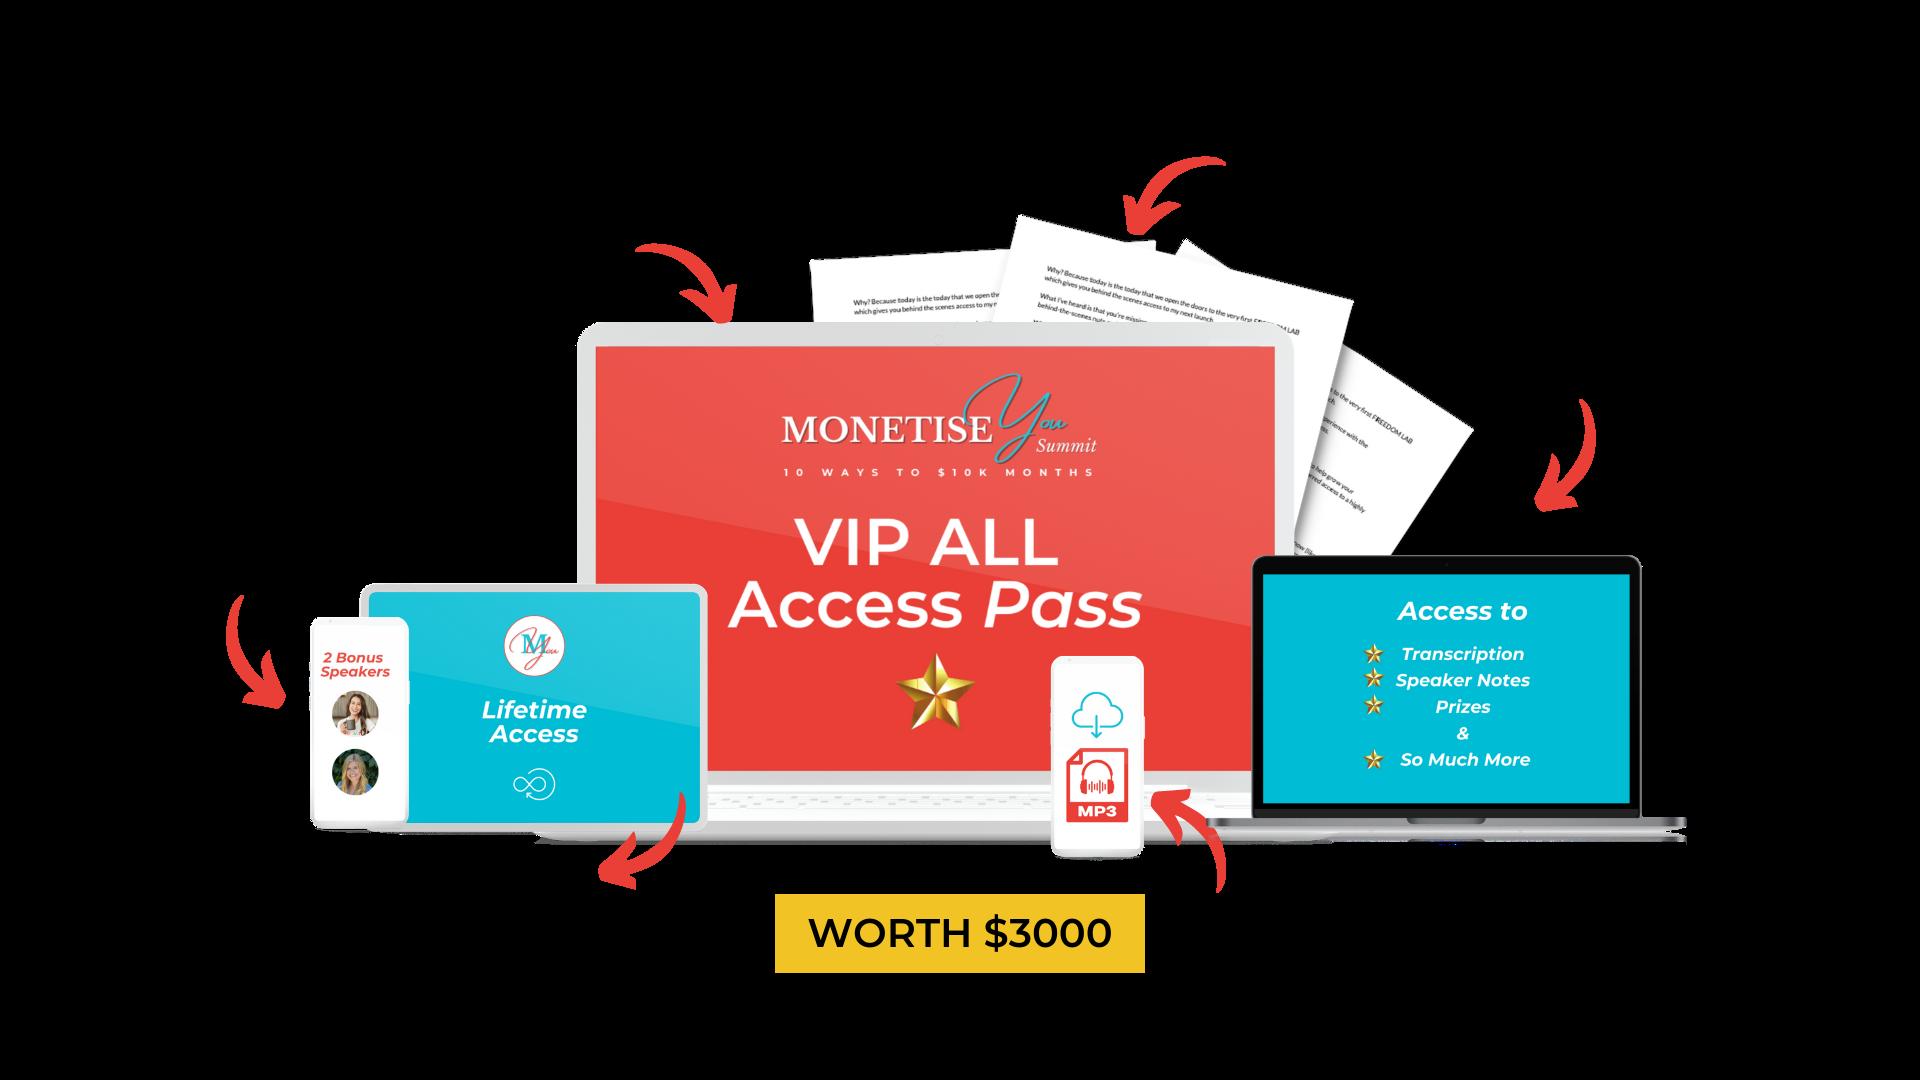 All VIP Access Pass